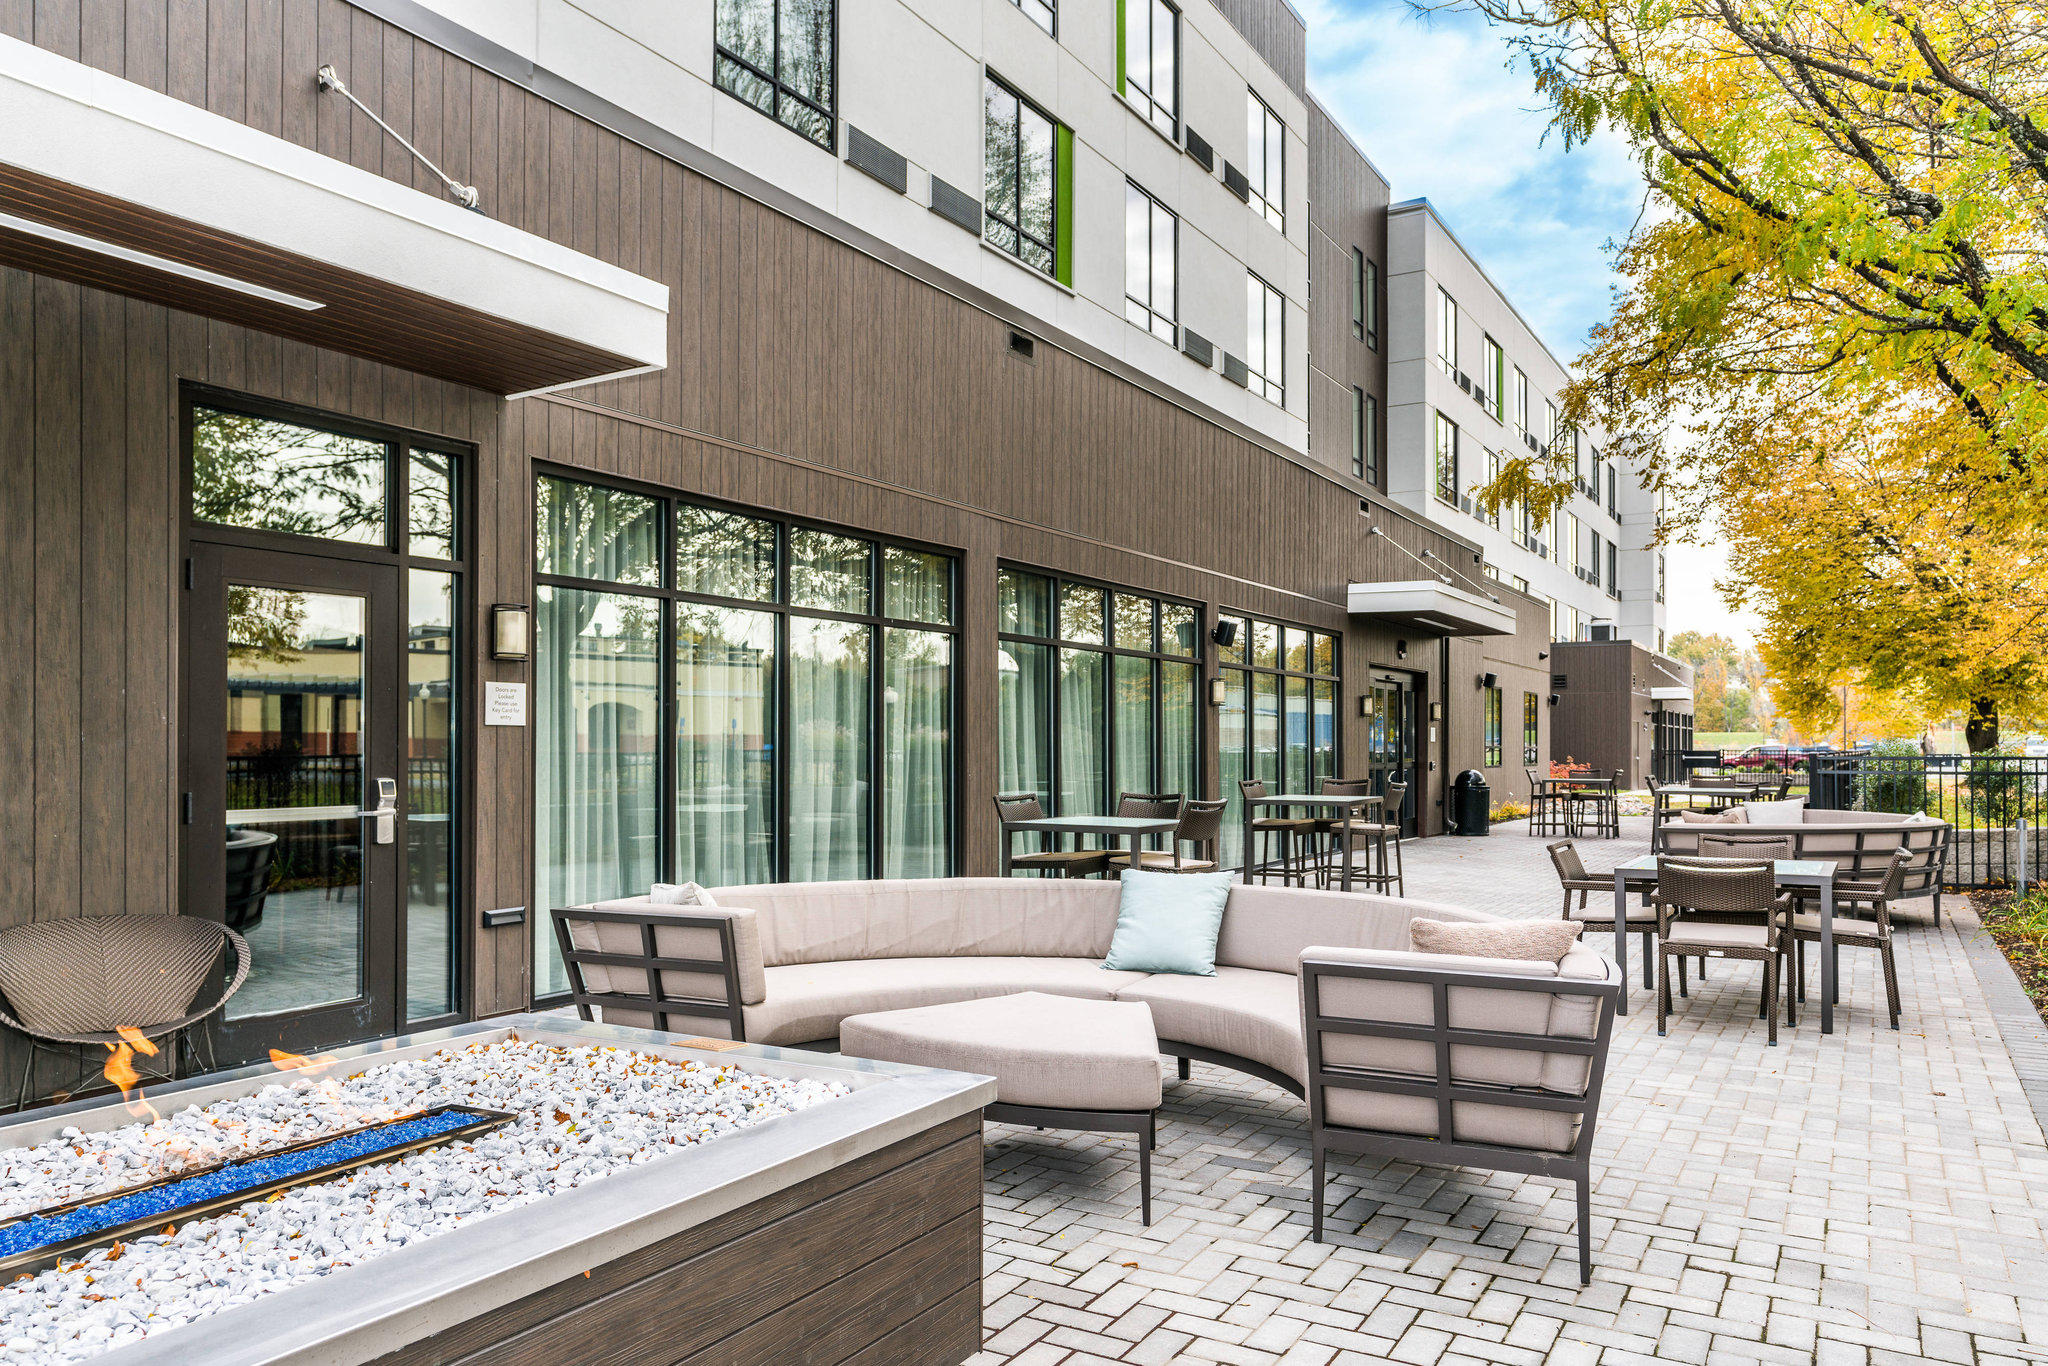 Courtyard by Marriott West Springfield